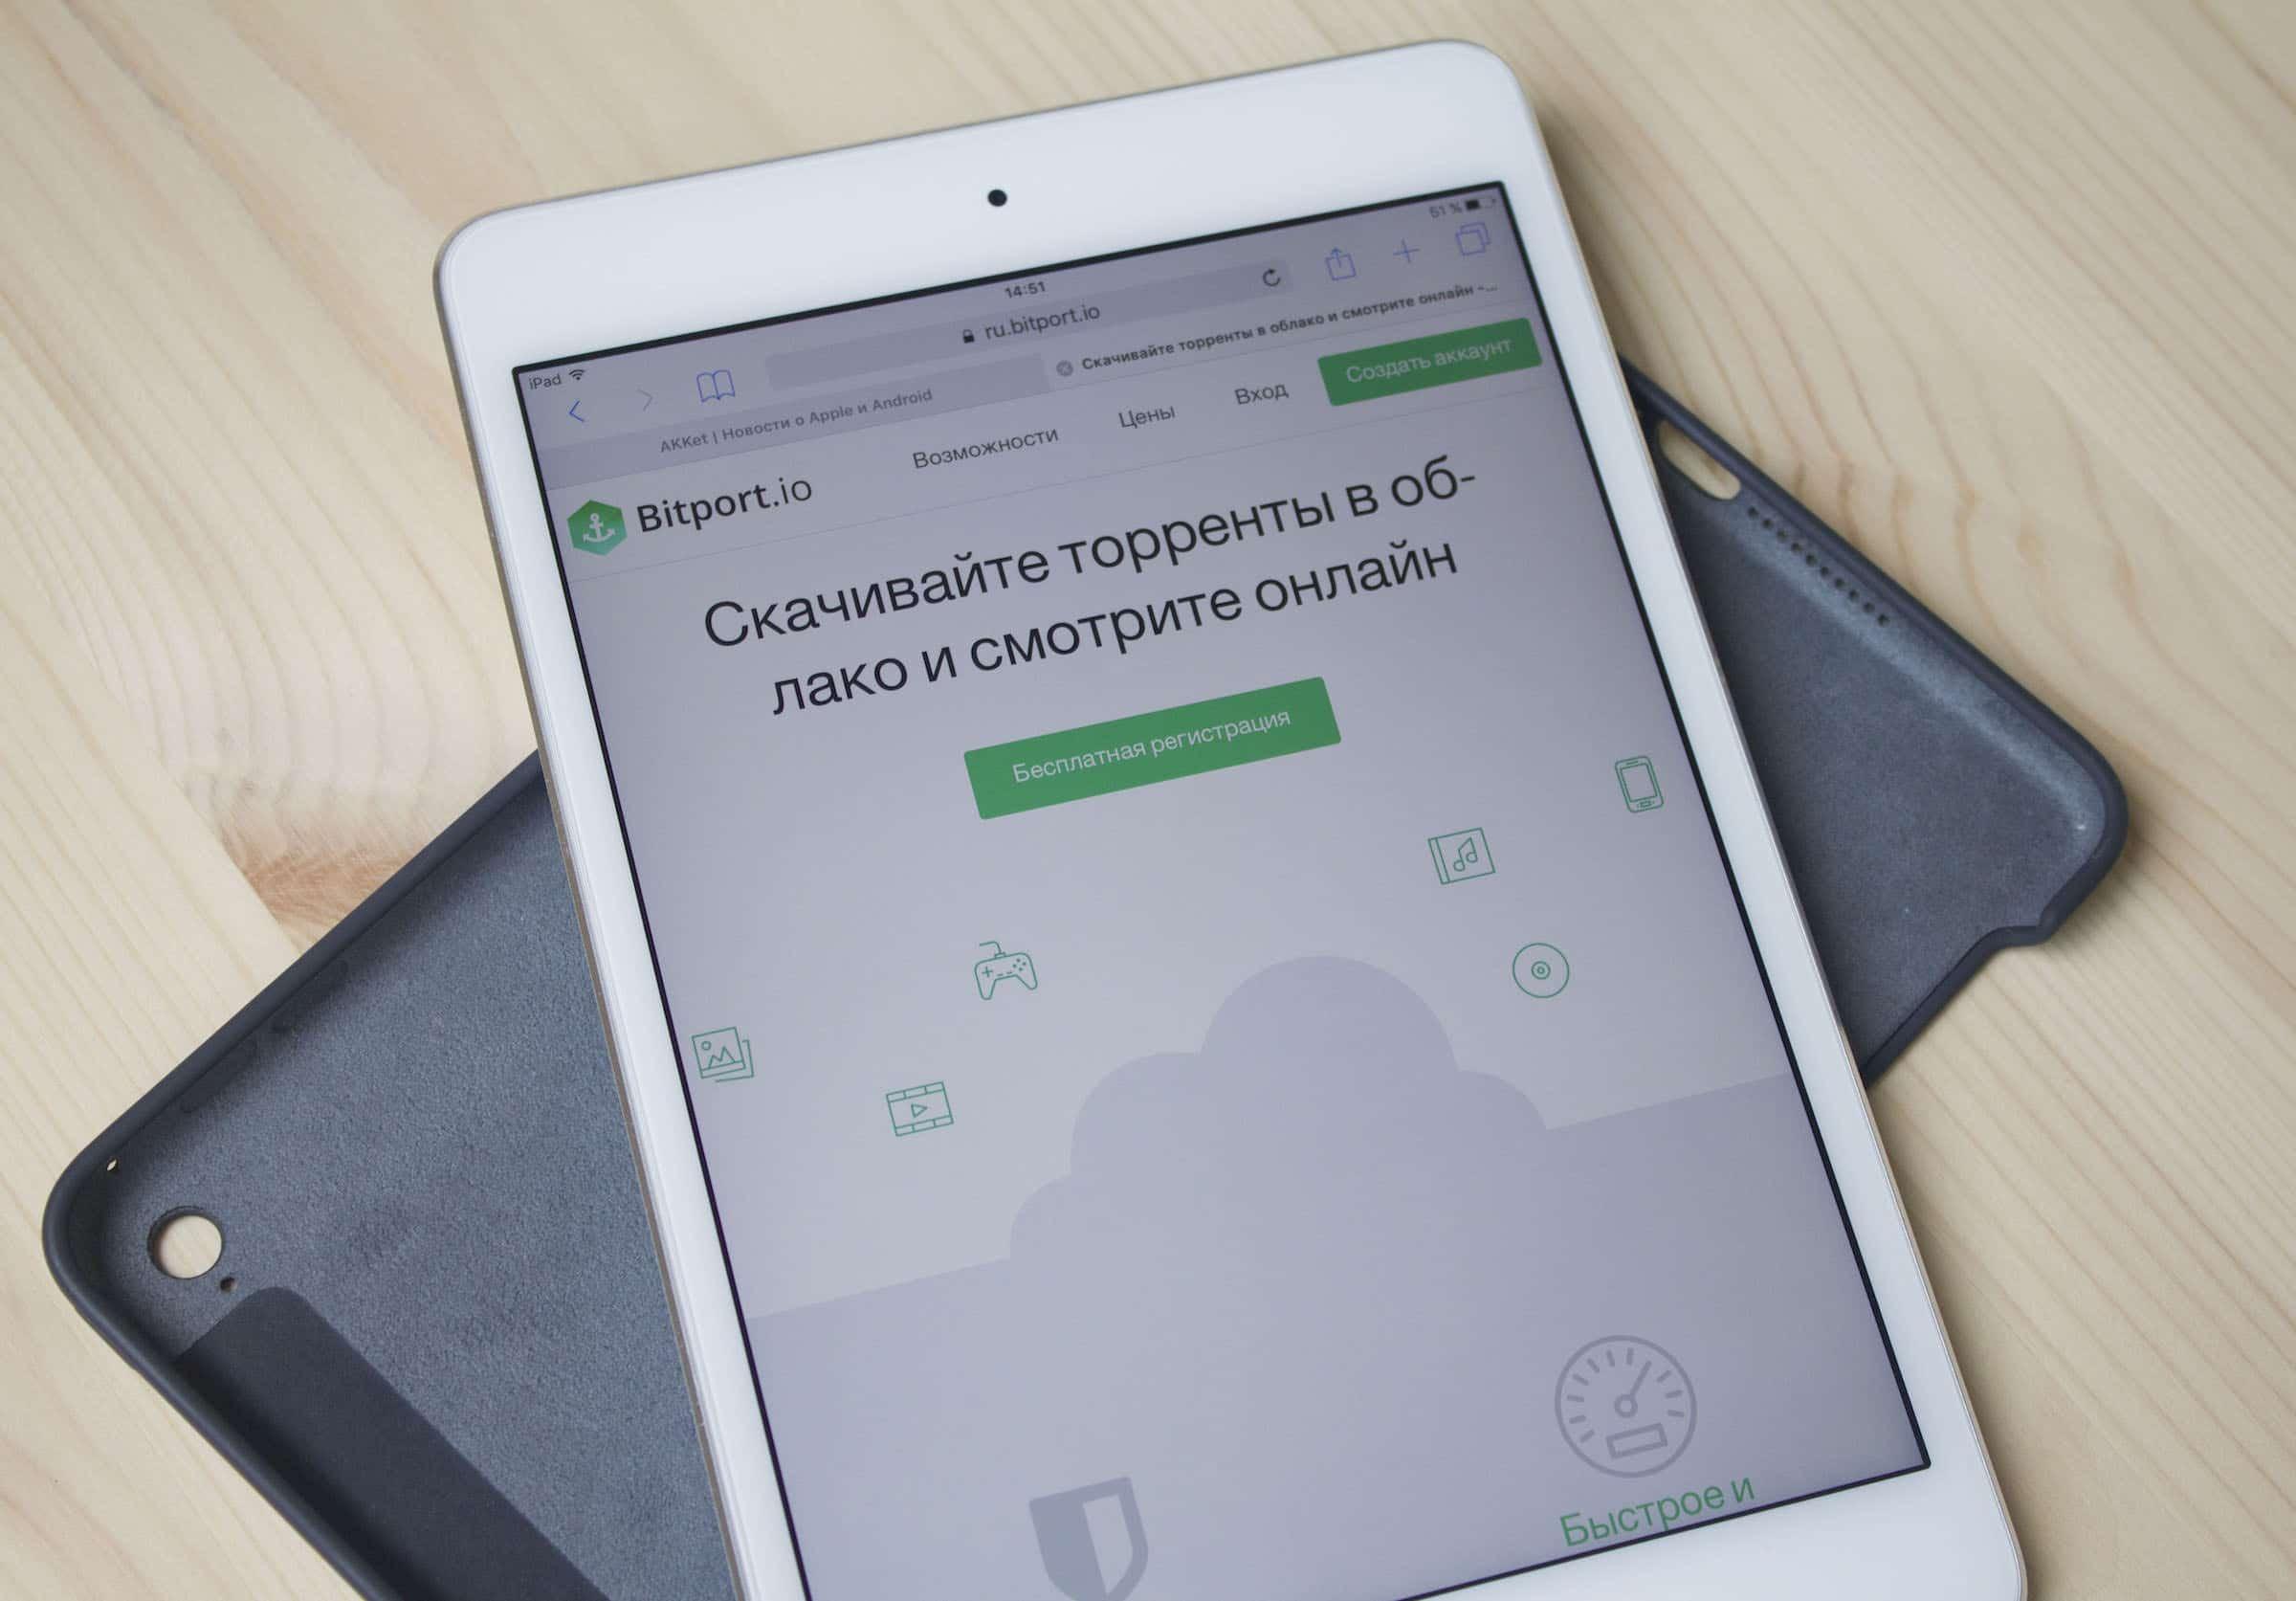 Bitport.io torrrent download iOS iPhone iPad android windows macOS 10